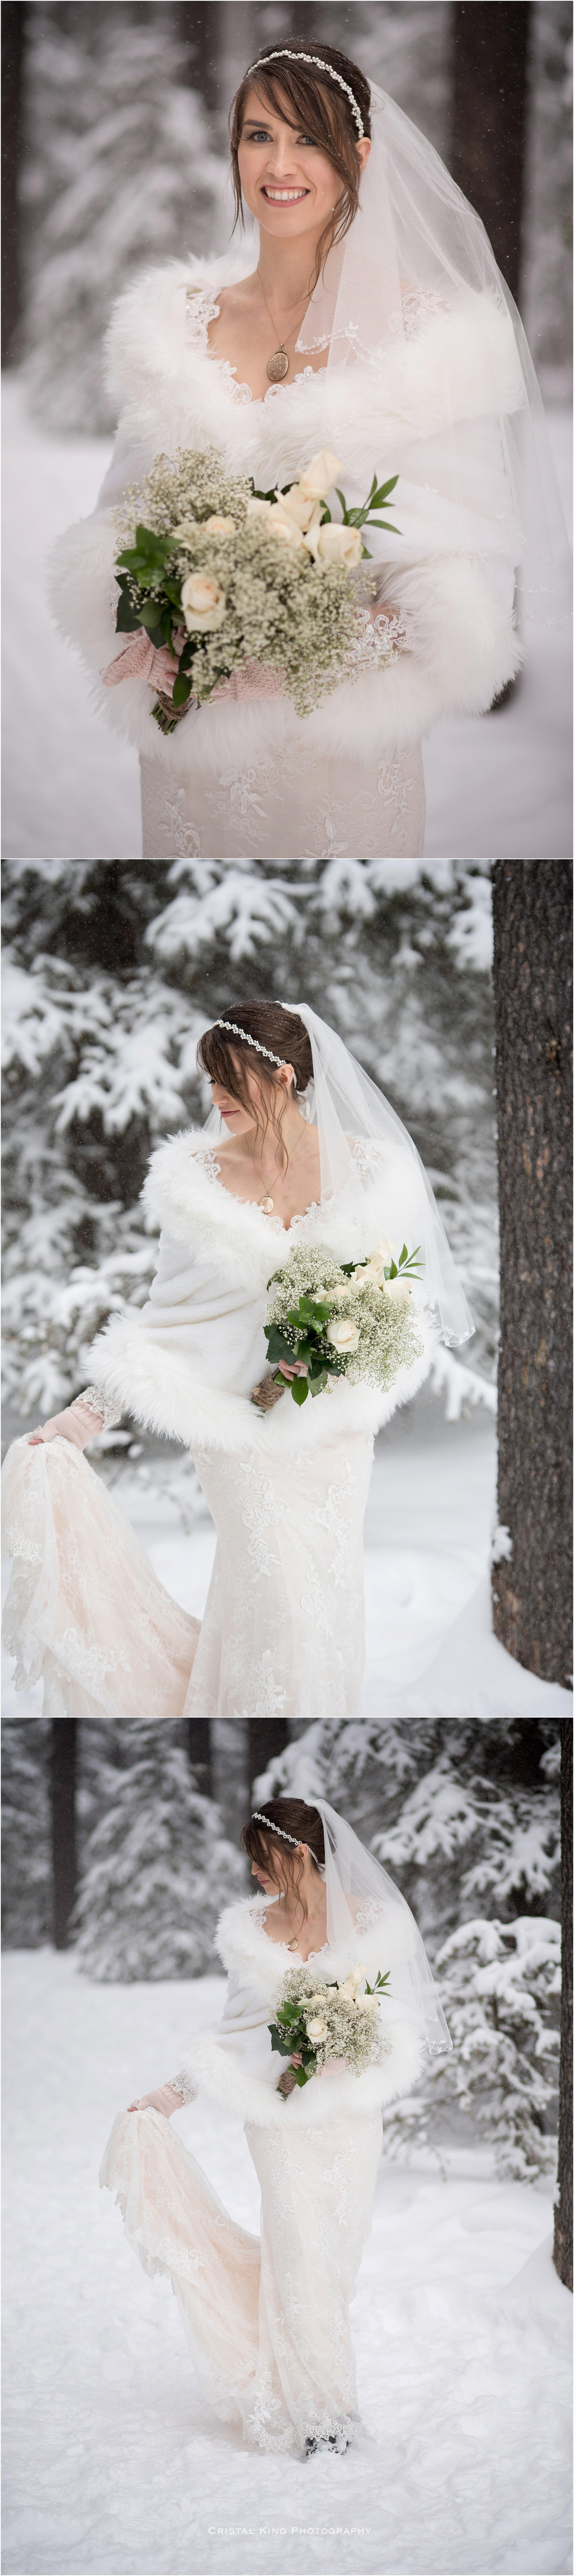 Jacqueline-Jasons-Wedding-87.jpg